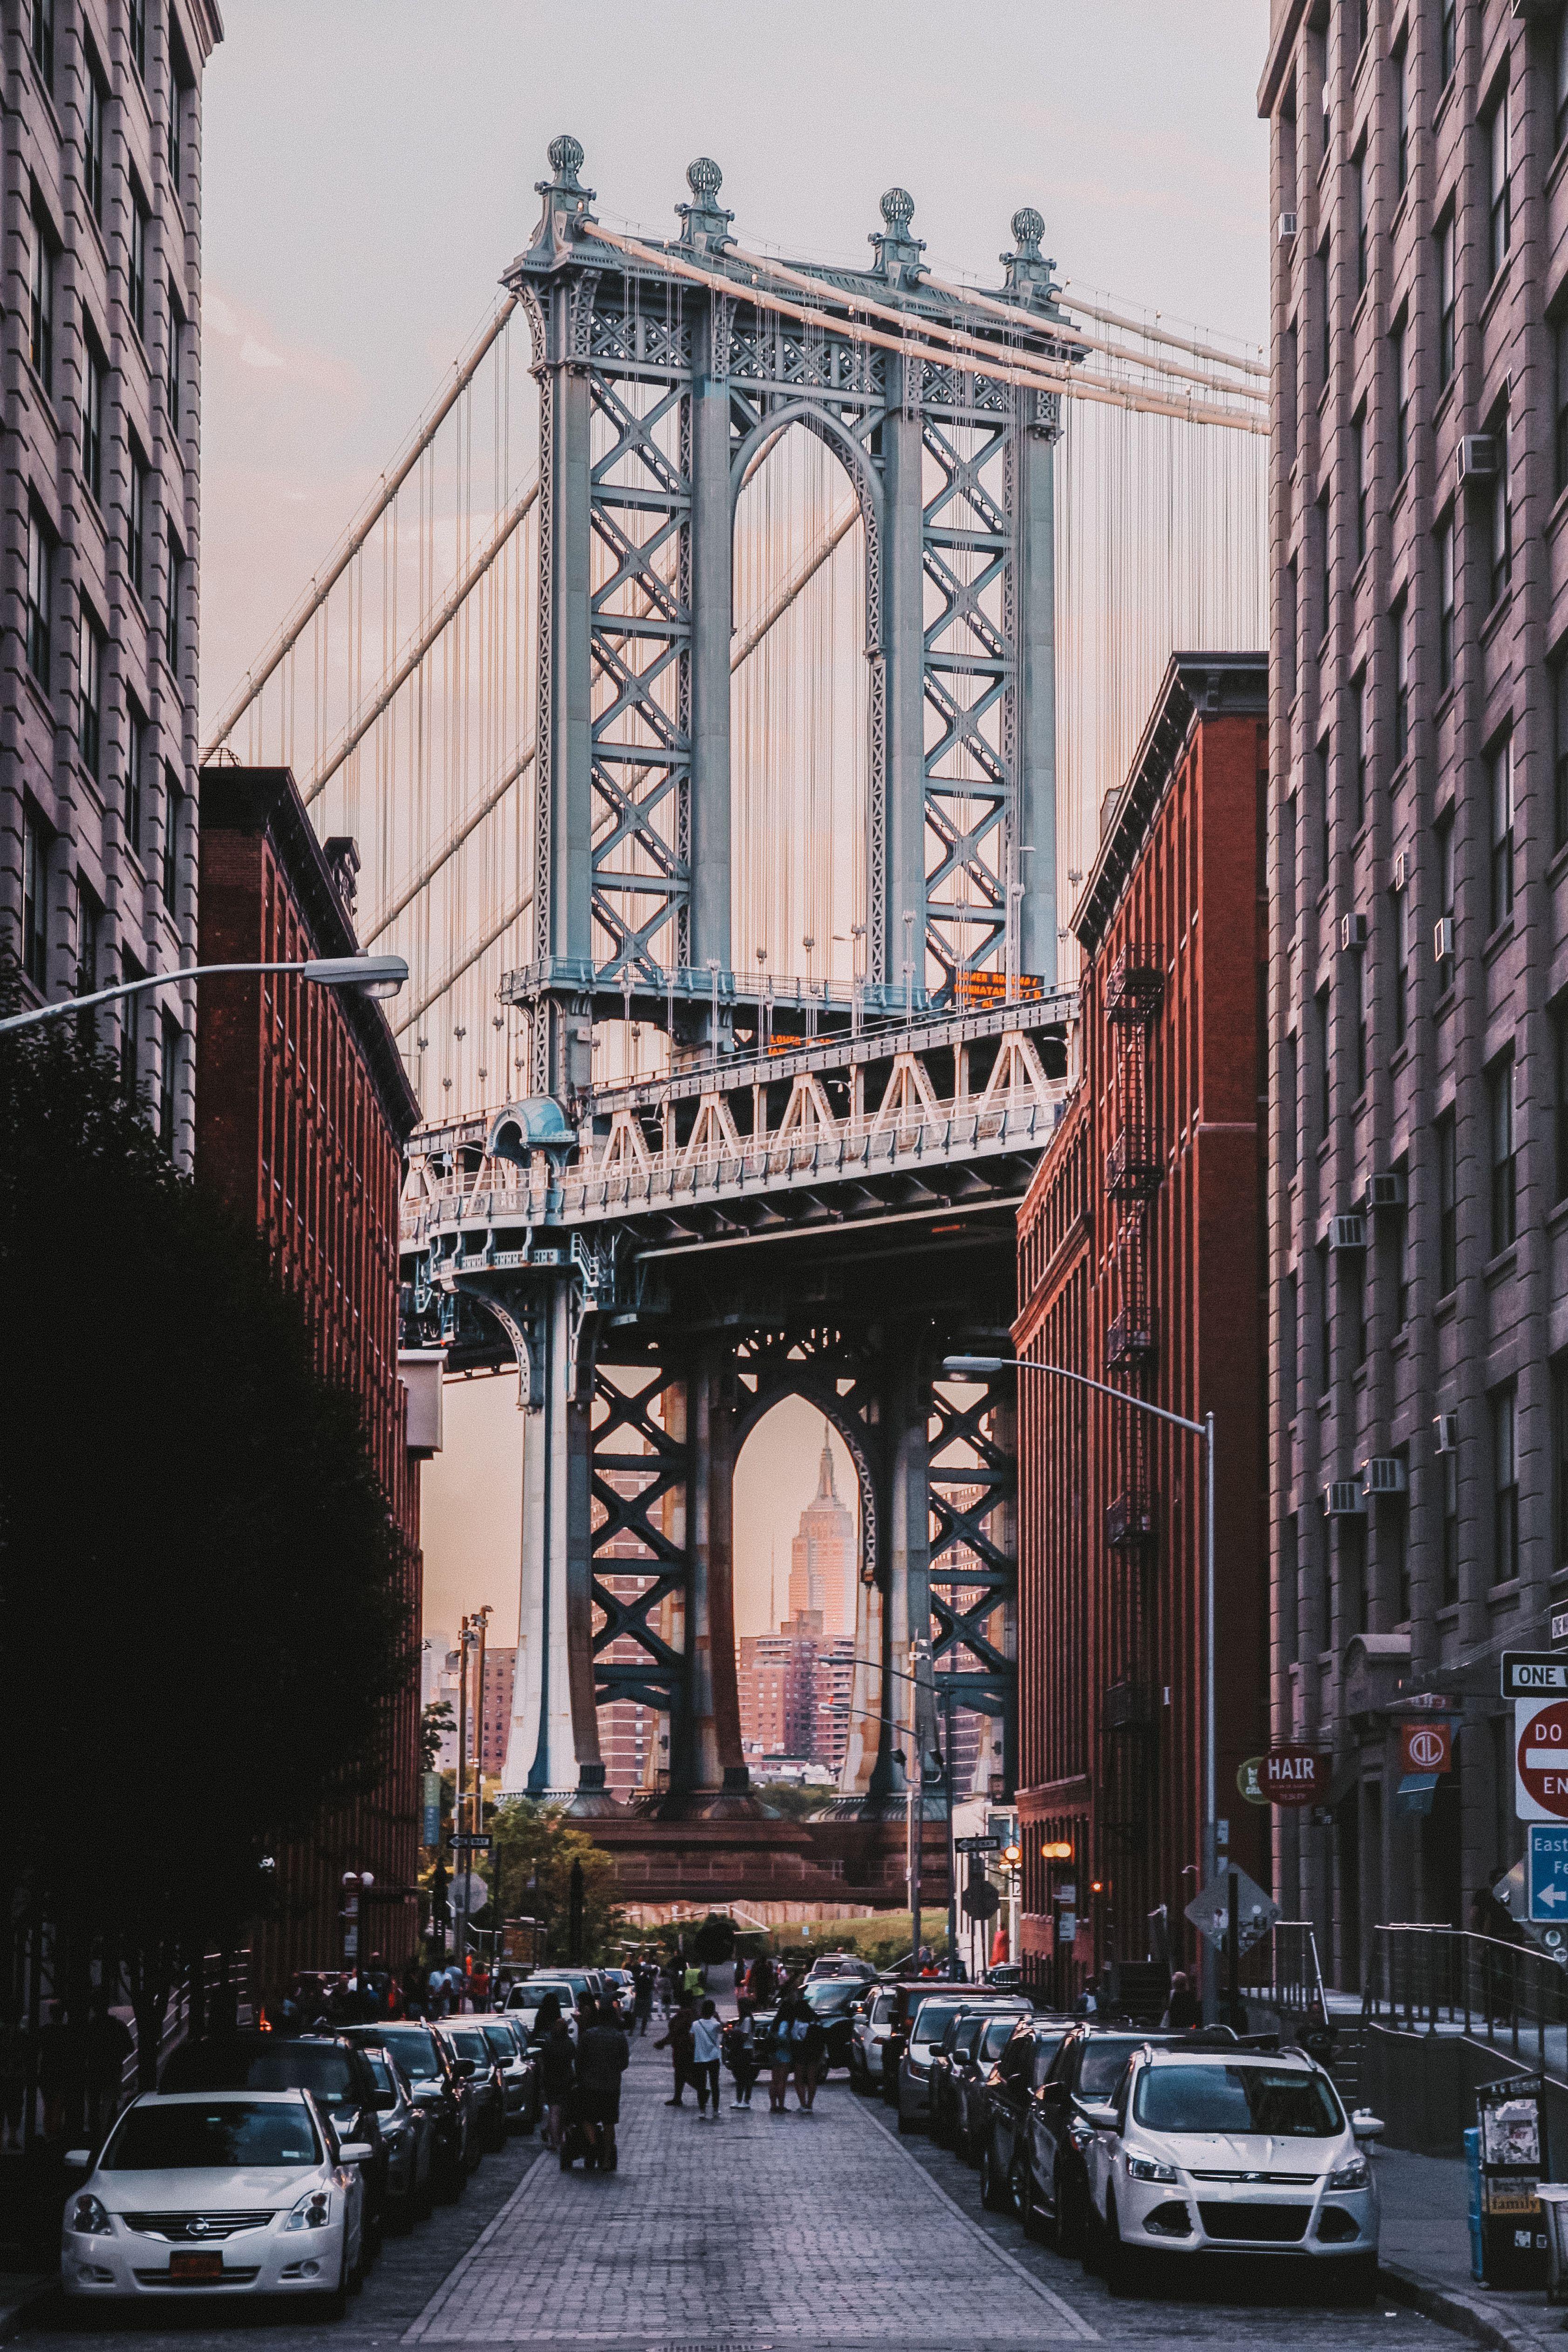 New York City By World Of Wanderlust New York City Travel New York Wallpaper New York Pictures